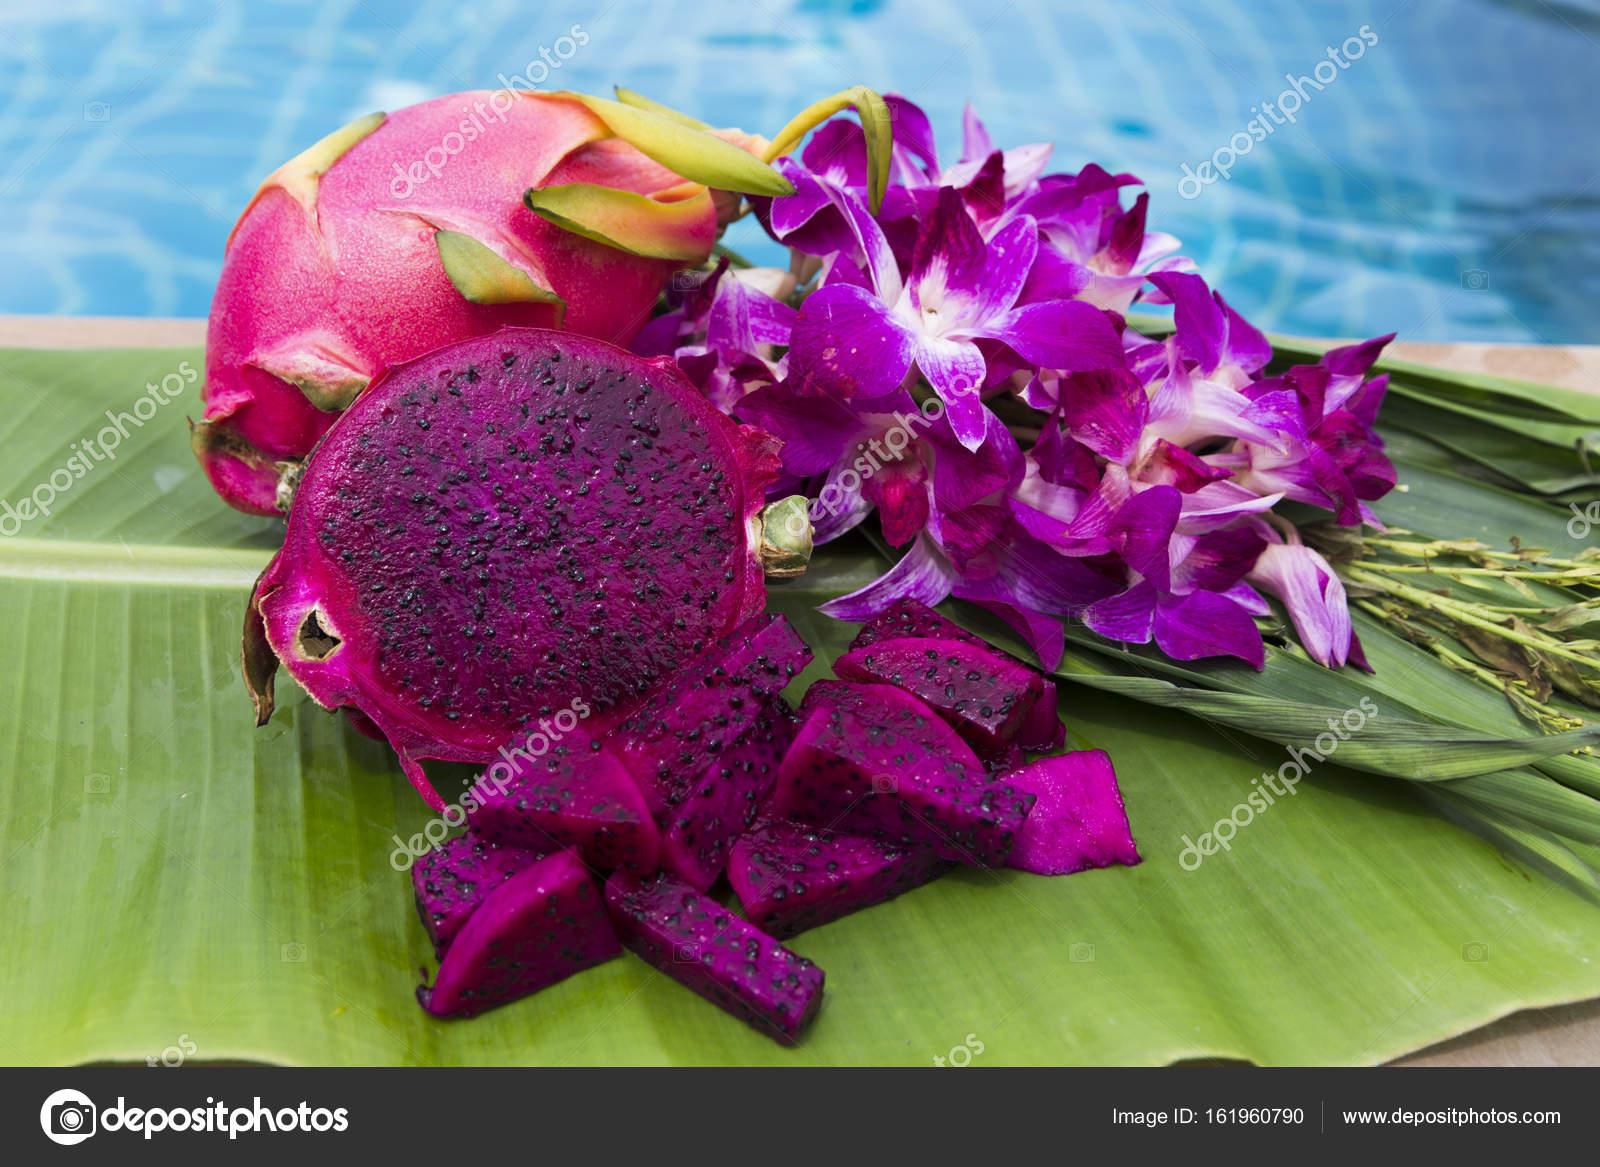 Pink Dragon Fruit Sweet And Juicy Stock Photo Zhykova 161960790